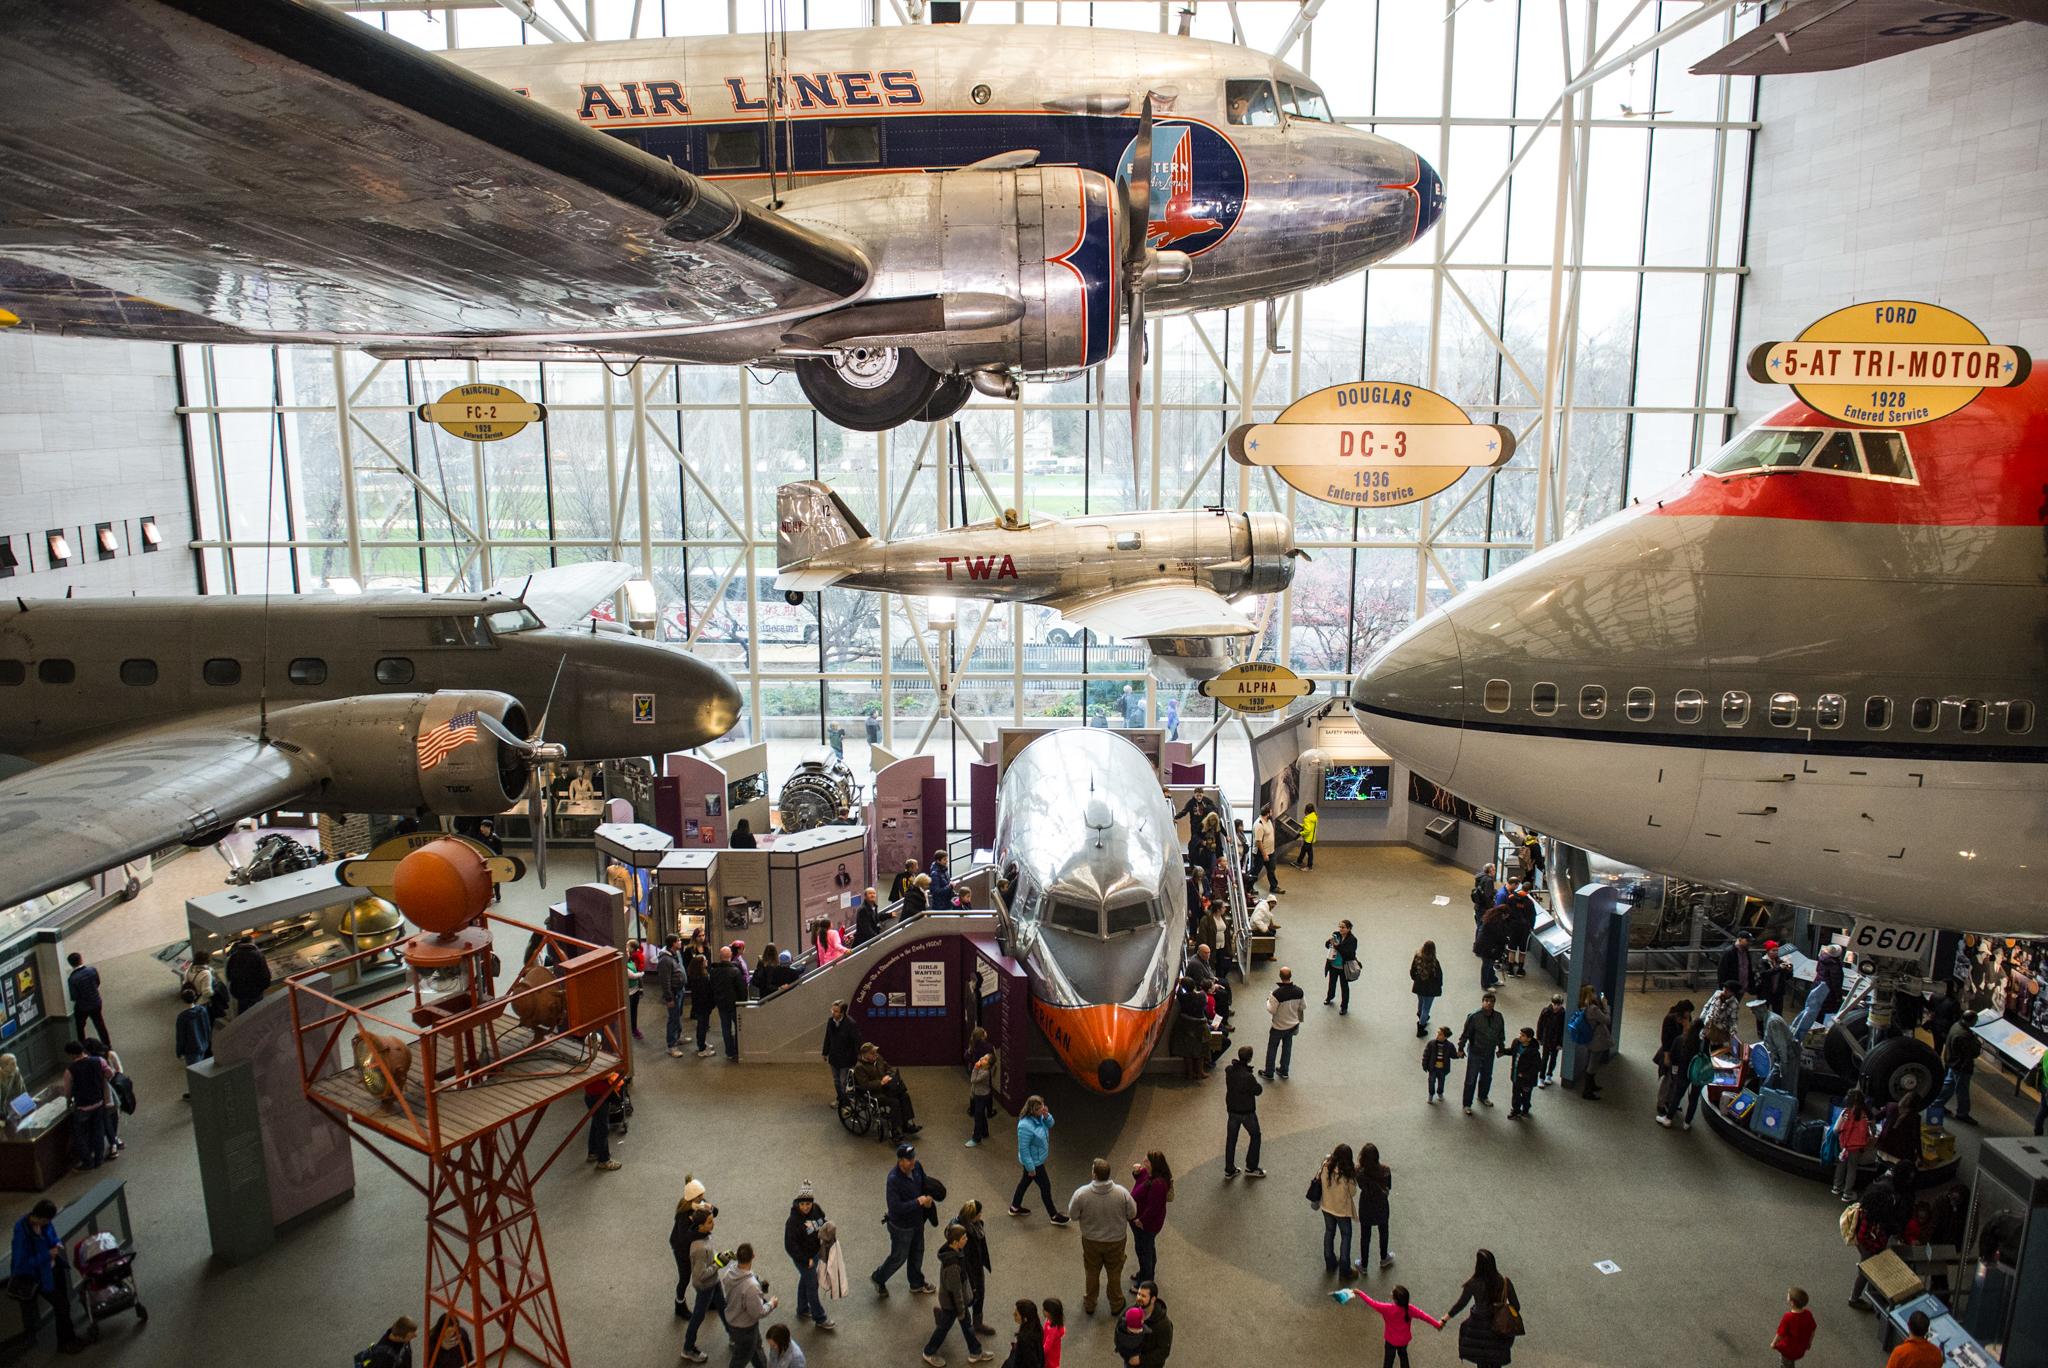 طائرات معروضة في متحف (© Saul Loeb/AFP/Getty Images)